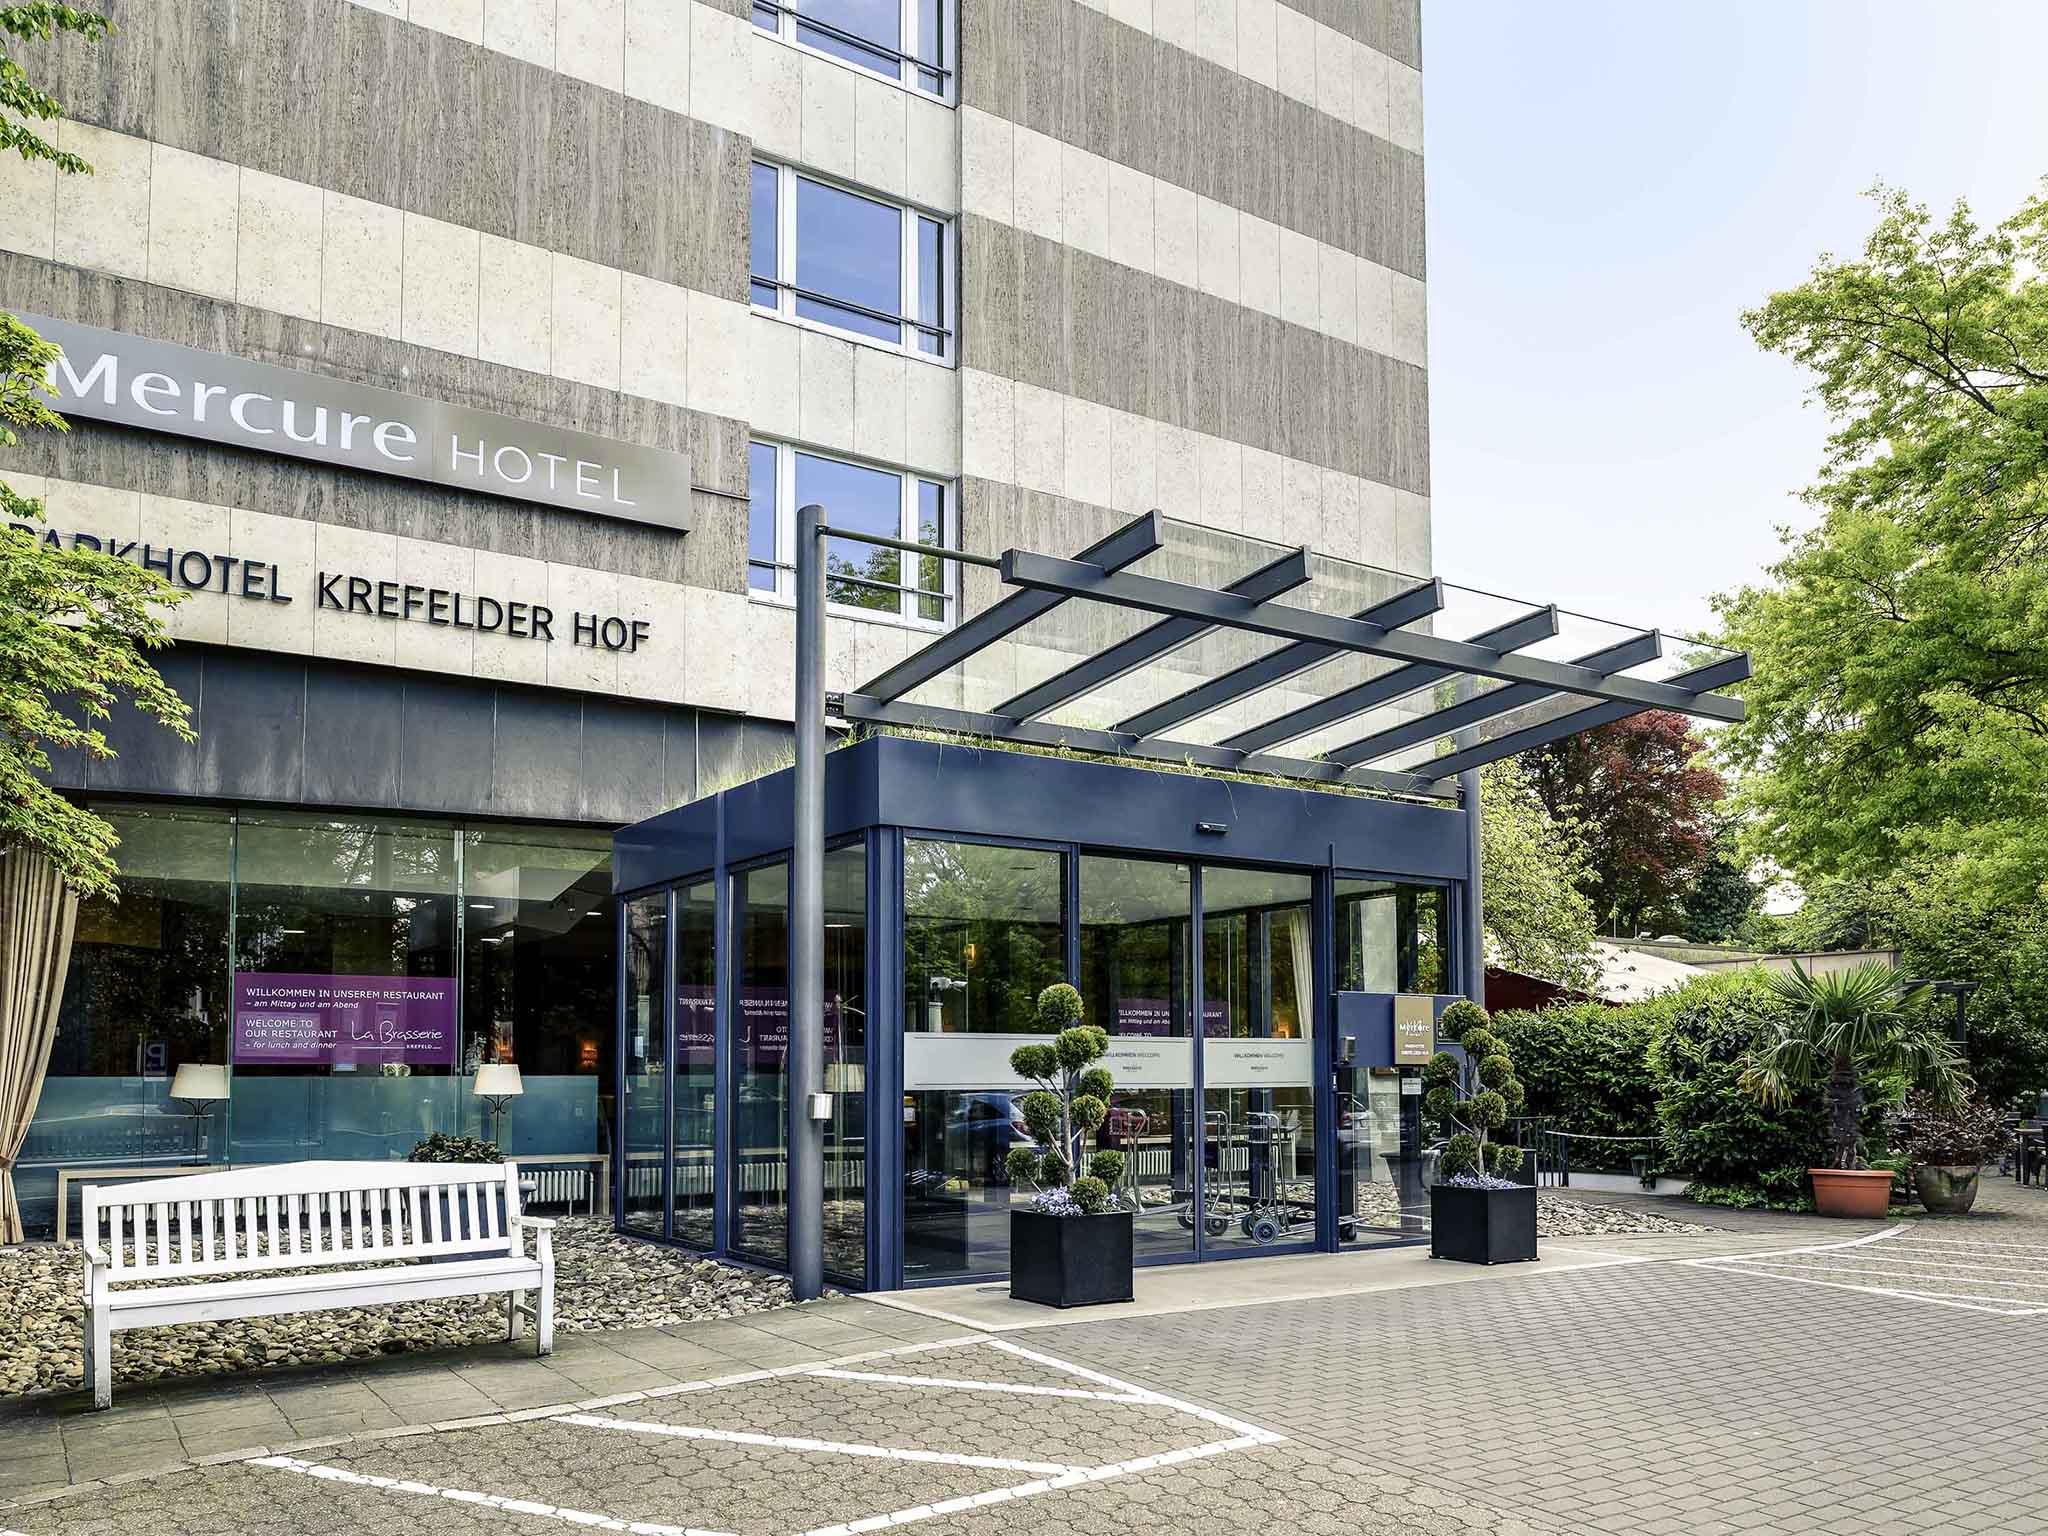 Otel – Mercure Parkhotel Krefelder Hof